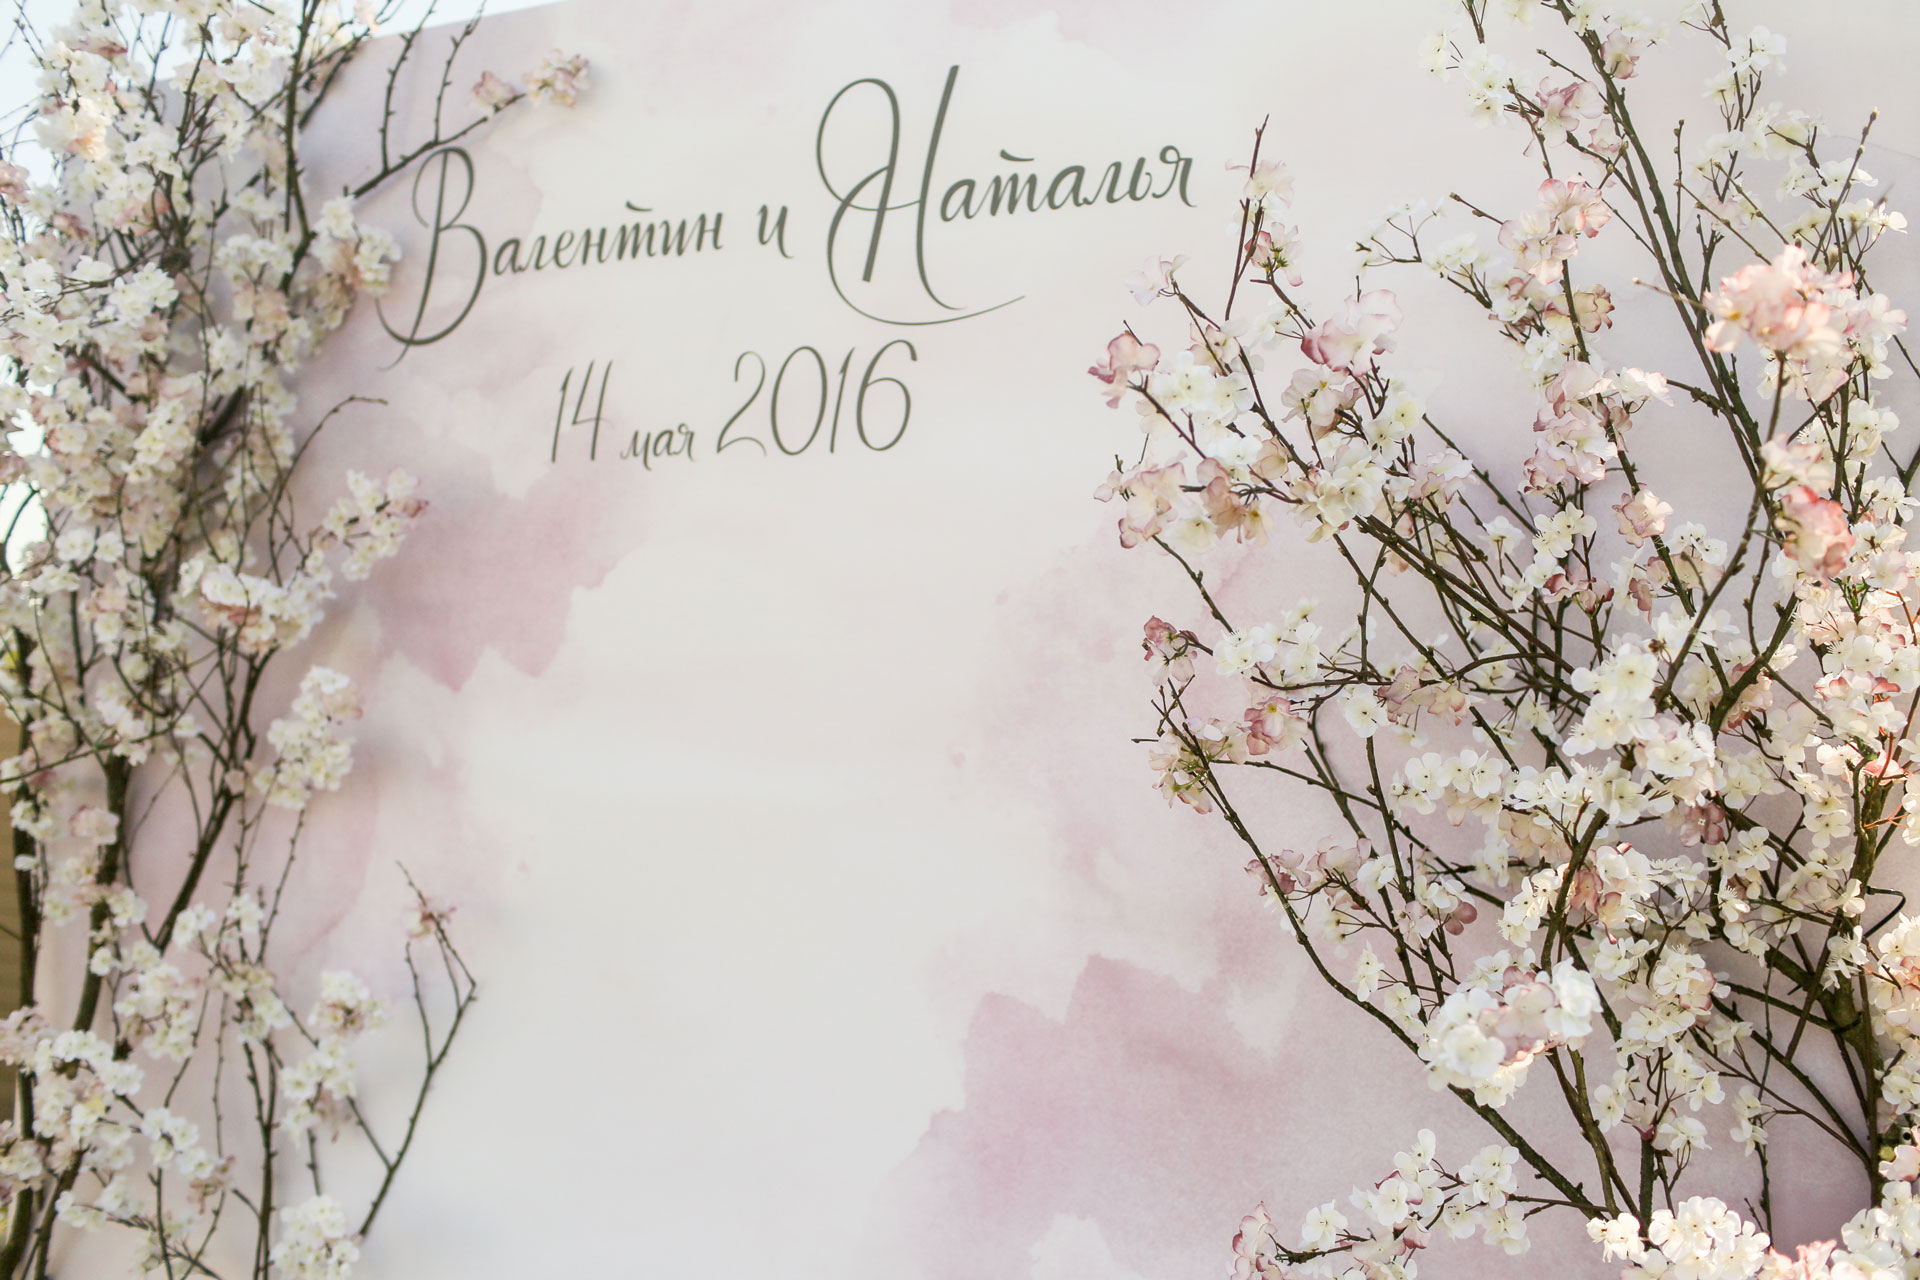 Вишневый сад. Свадьба Валентина Кротова и Натальи Ходуновой фото 5